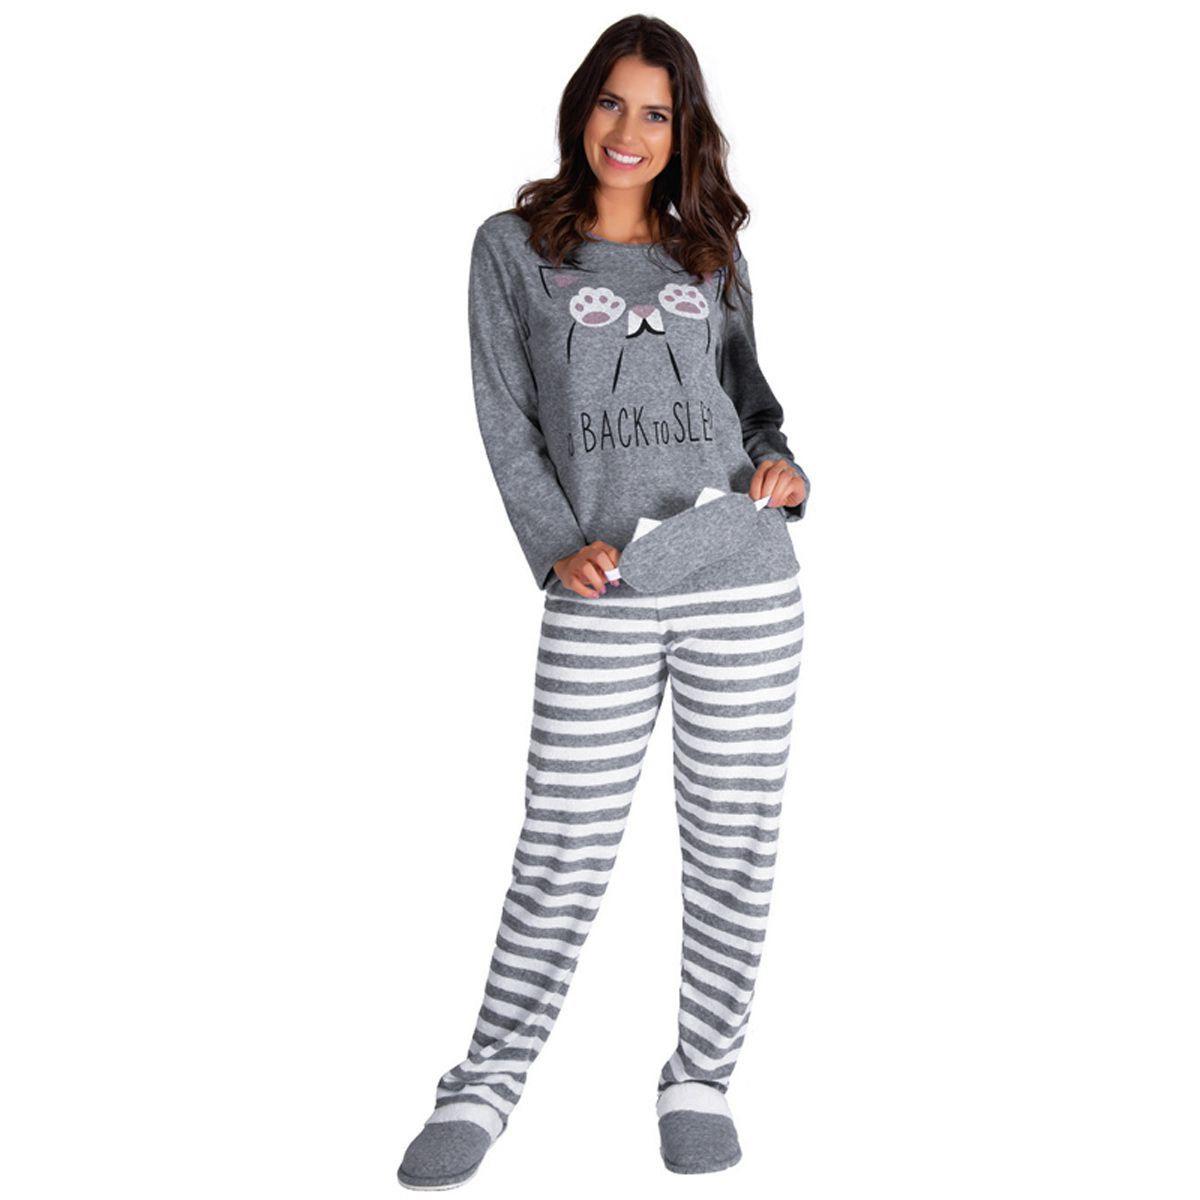 Pijama Feminino de Inverno Estampado Plush - Victory 19123